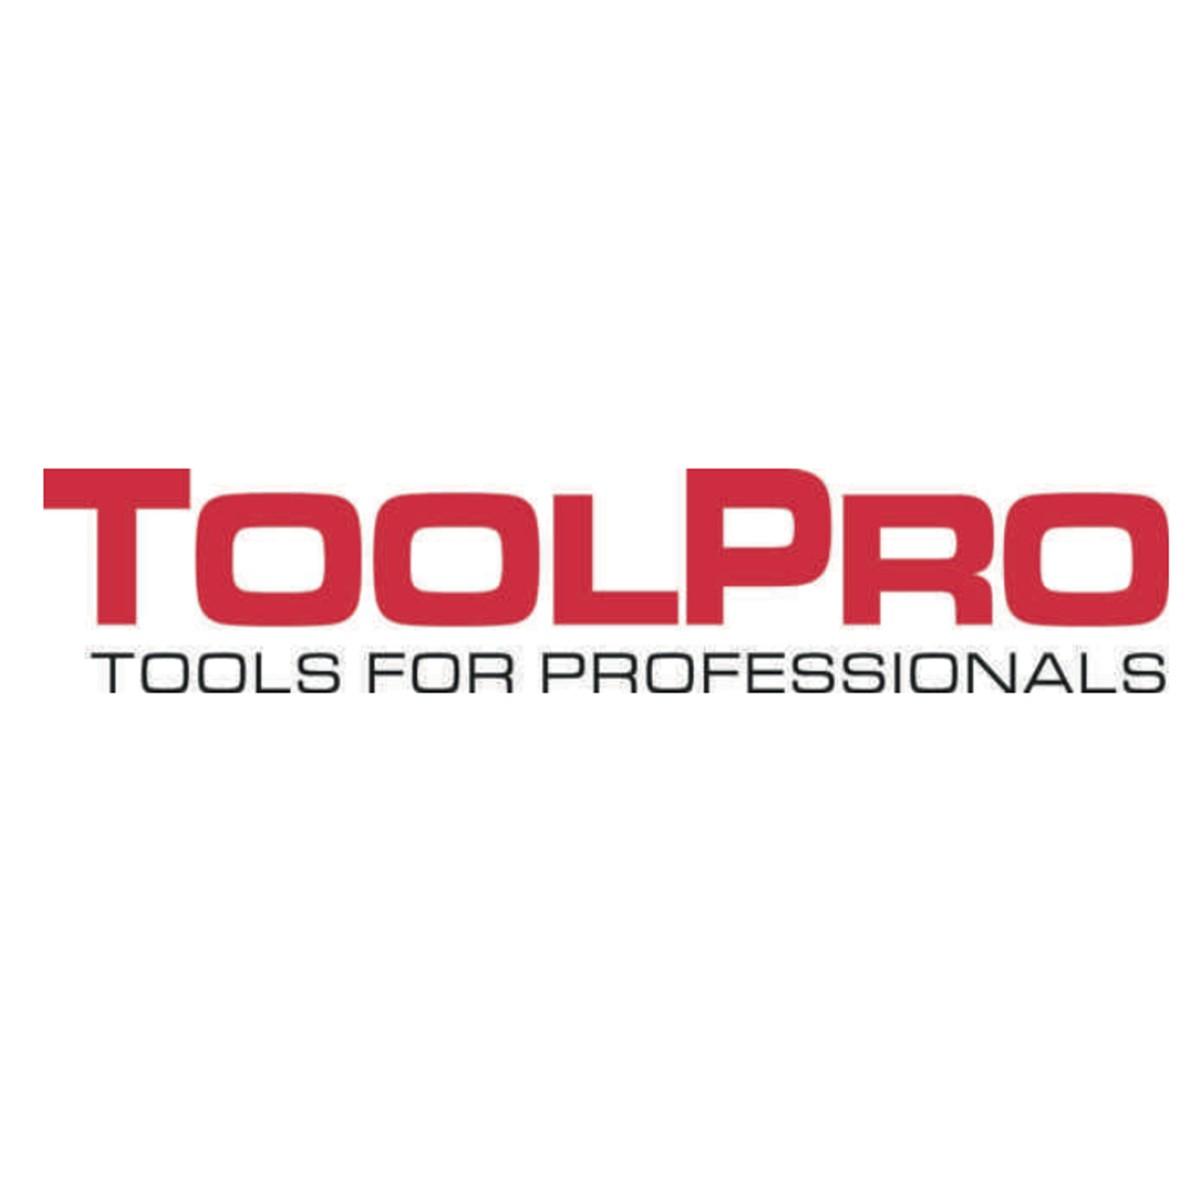 Tool Pro